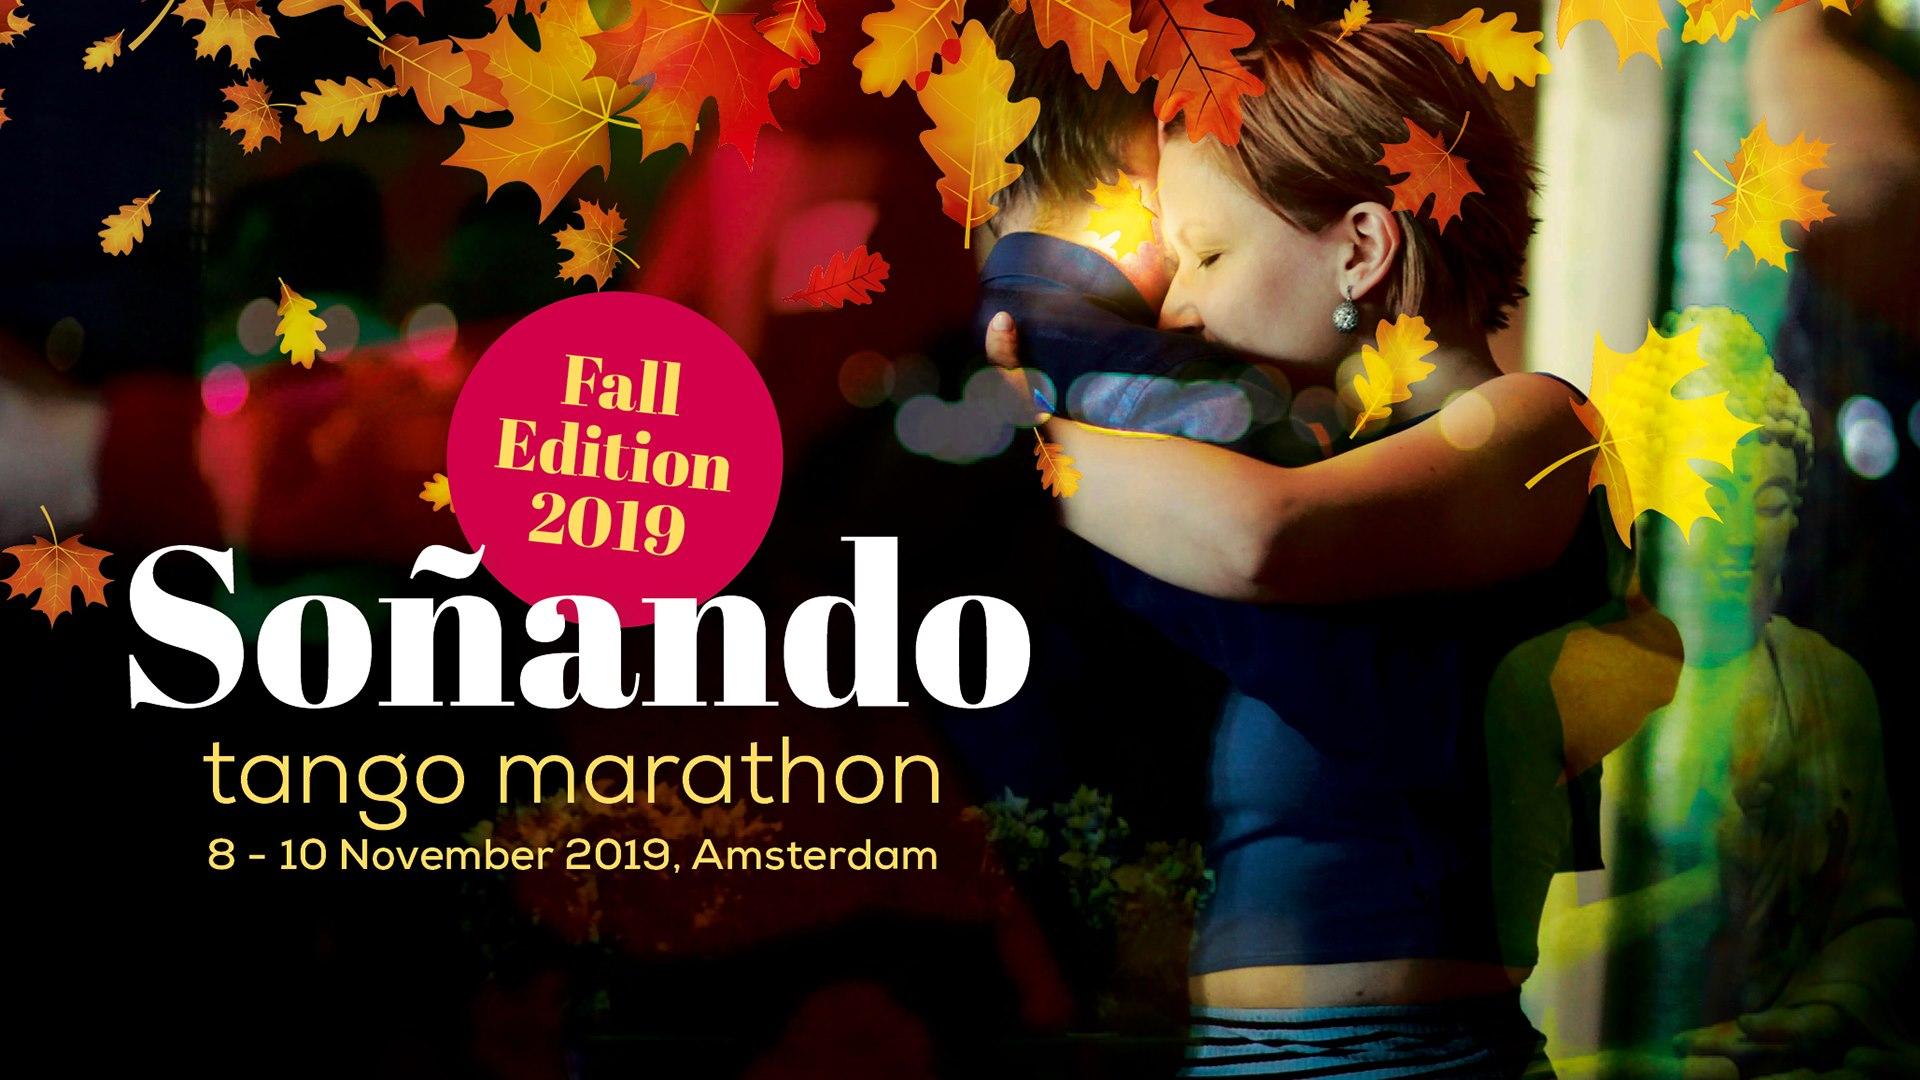 N°95/ Sonando Tango Marathon, Amsterdam (NL)